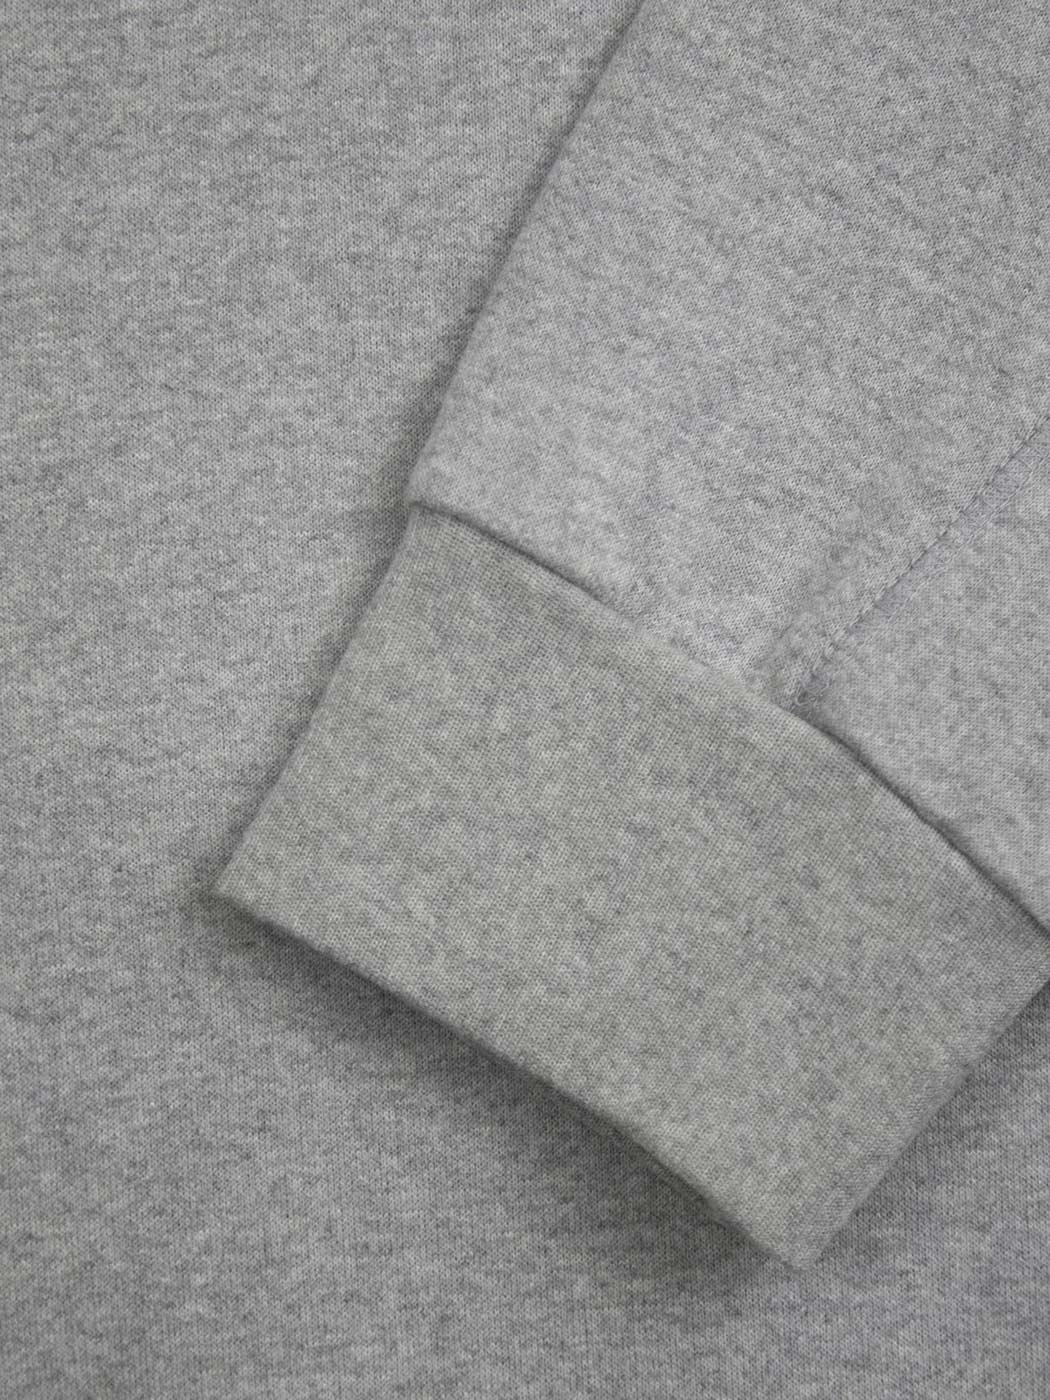 grey sweatshirt dress detail